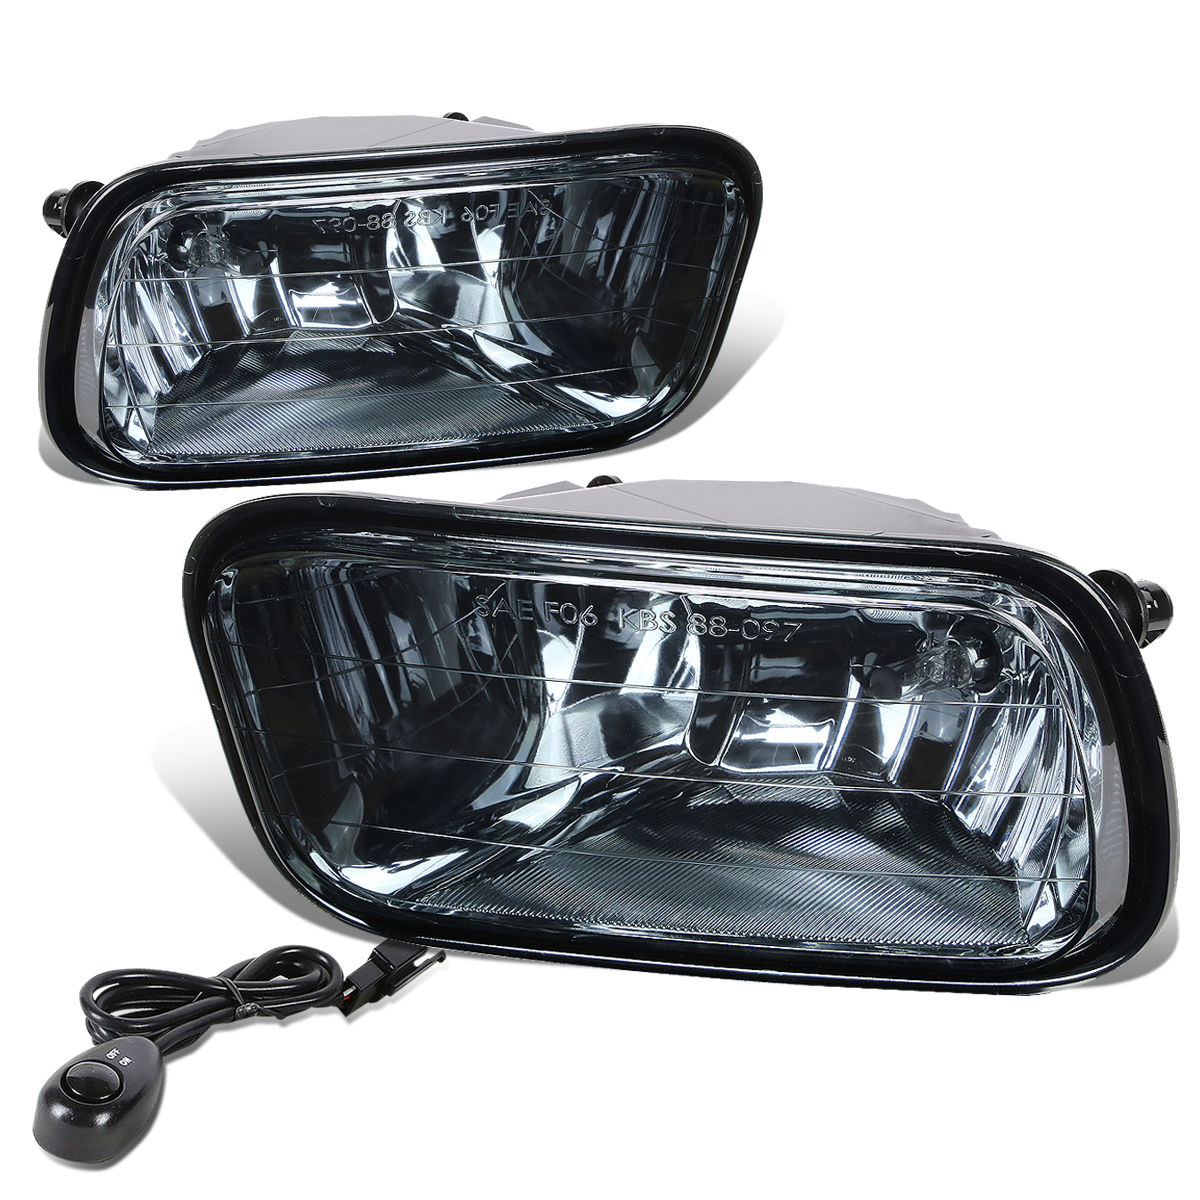 For 09-12 Dodge Ram DS / DJ Pair of Bumper Driving Fog Lights + Switch (Smoke Lens) 10 11